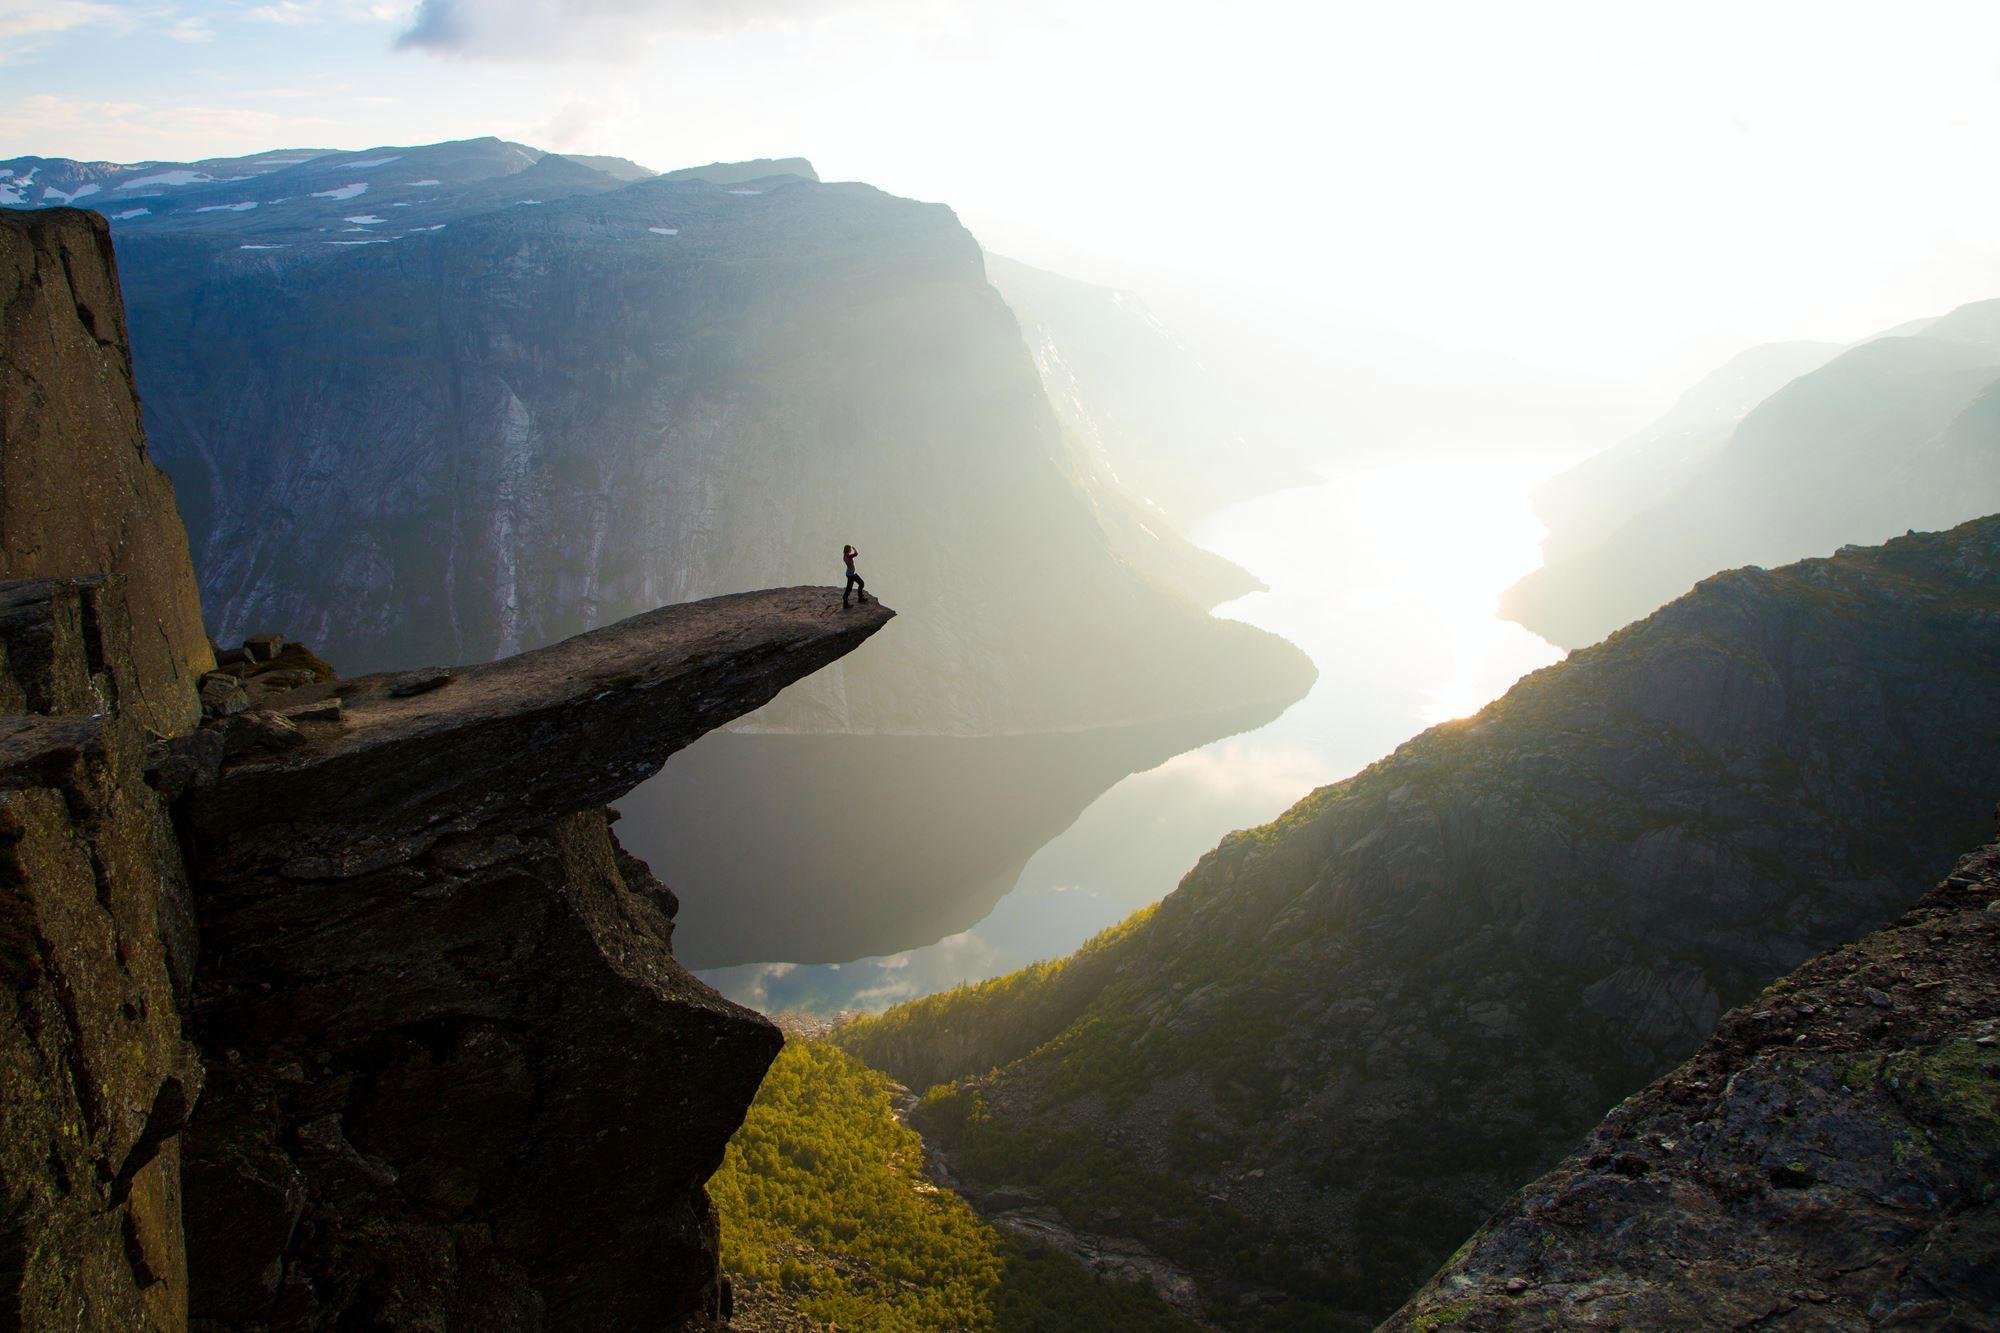 Колодец Тора, США    Природную воронку диаметром 5 метров в про